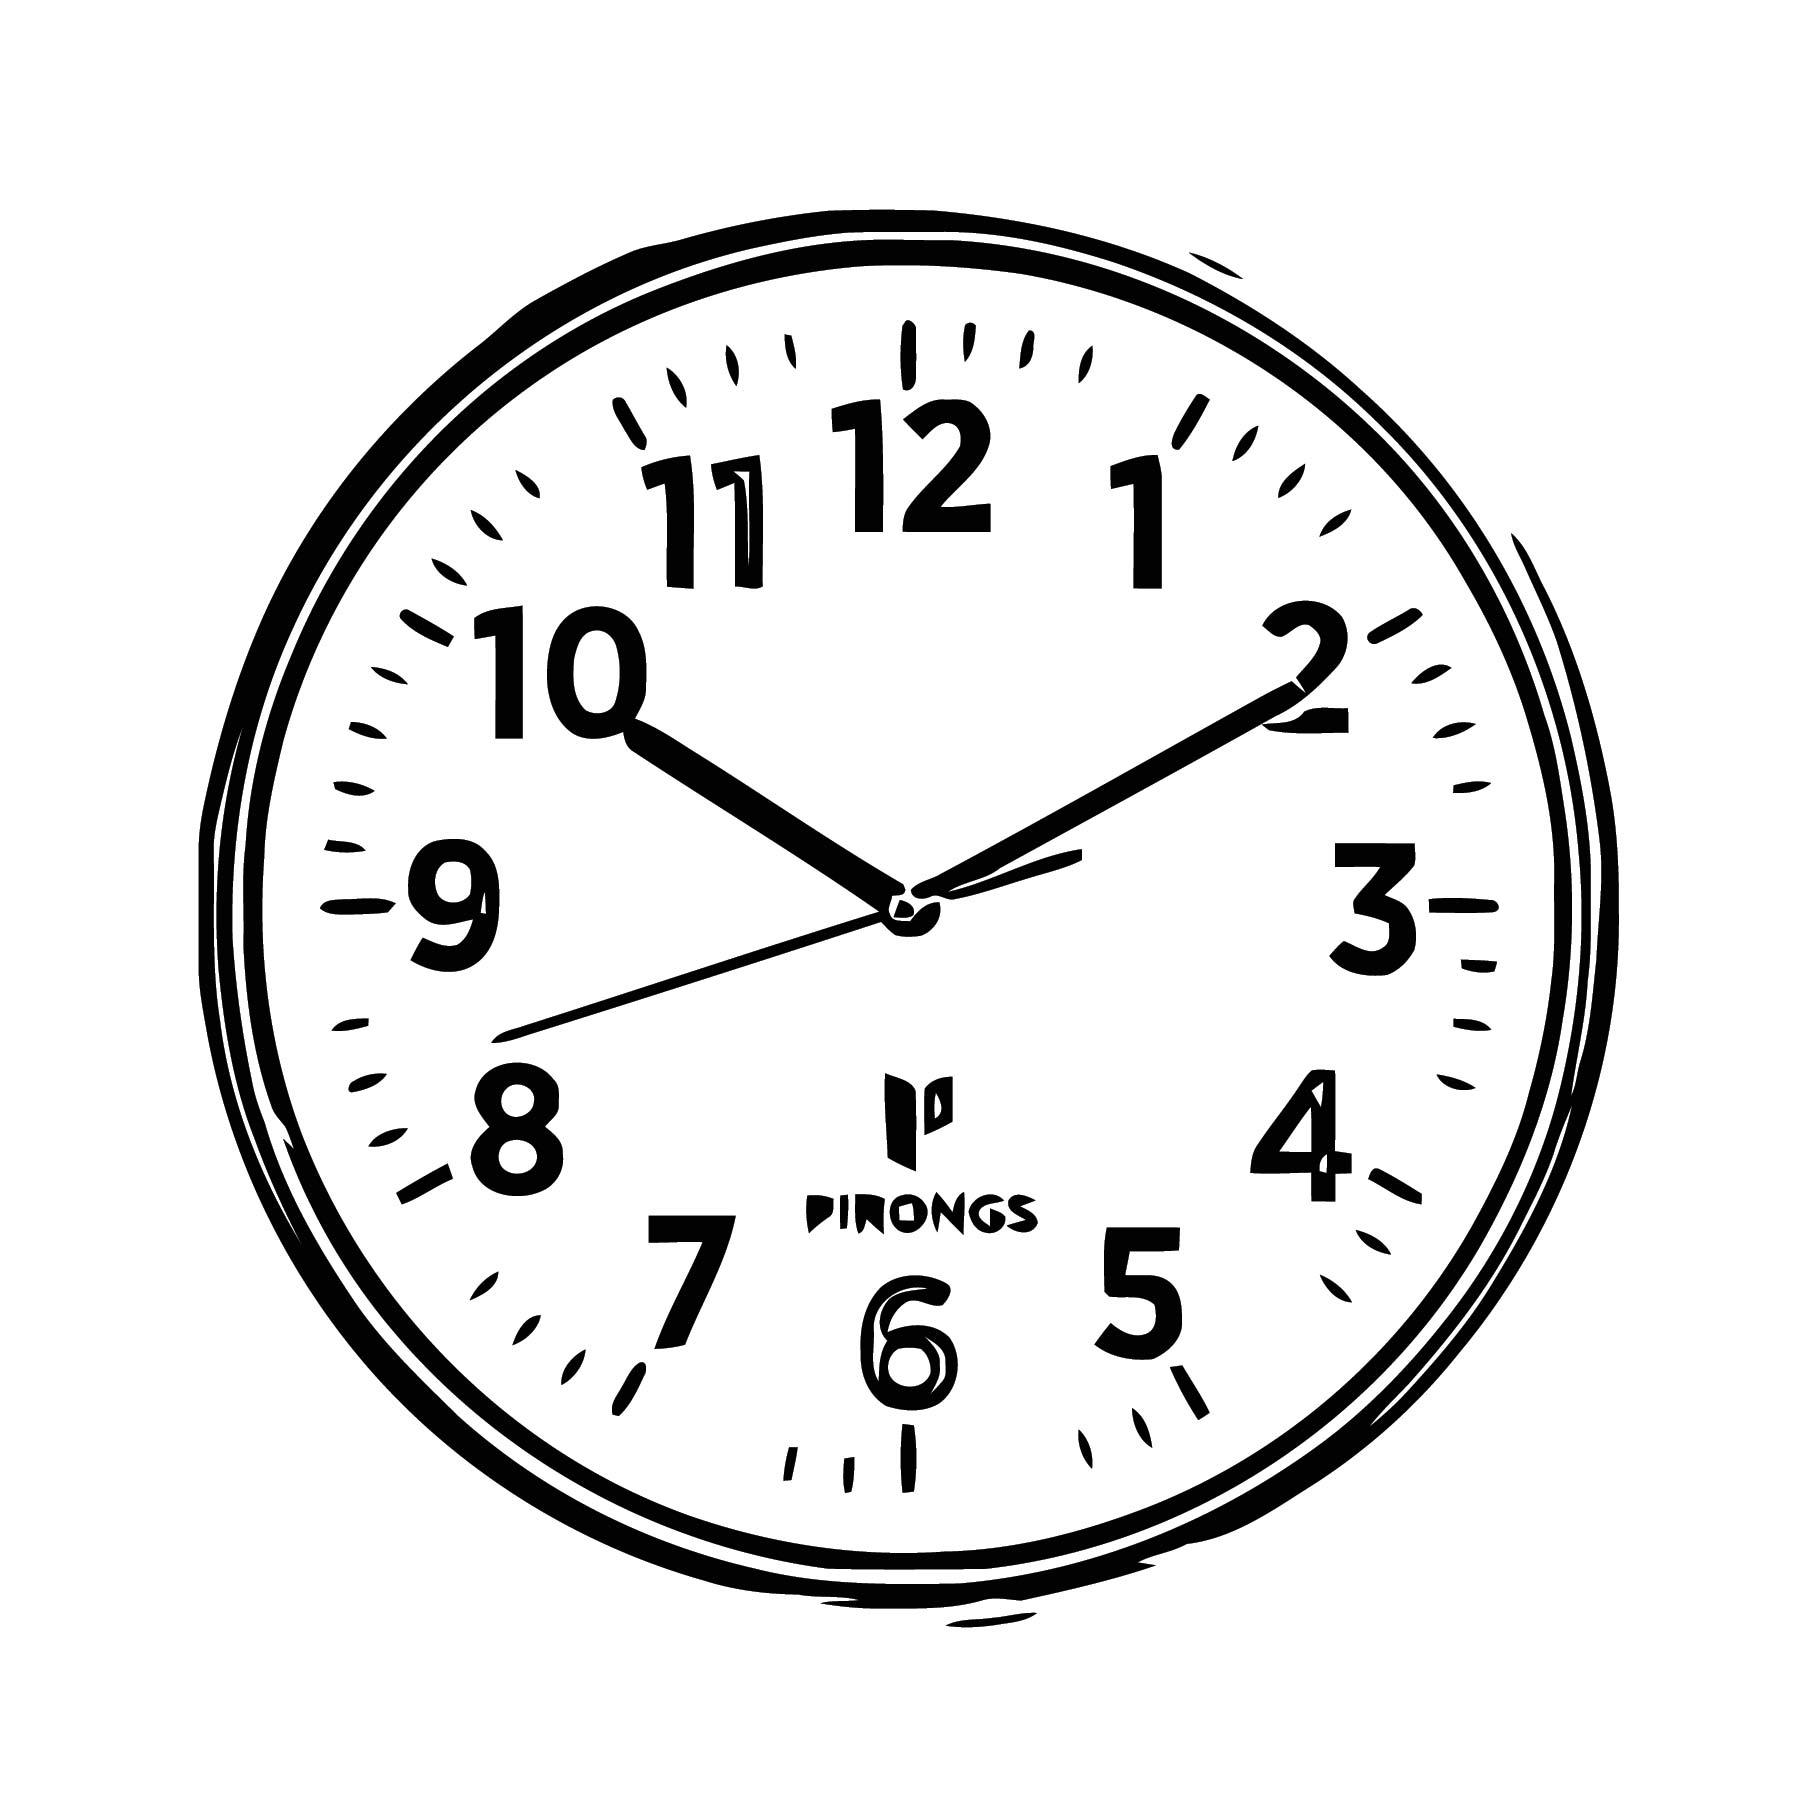 Pirongs Clock Free Printable 1 Cartoonized Free Printable Coloring Page